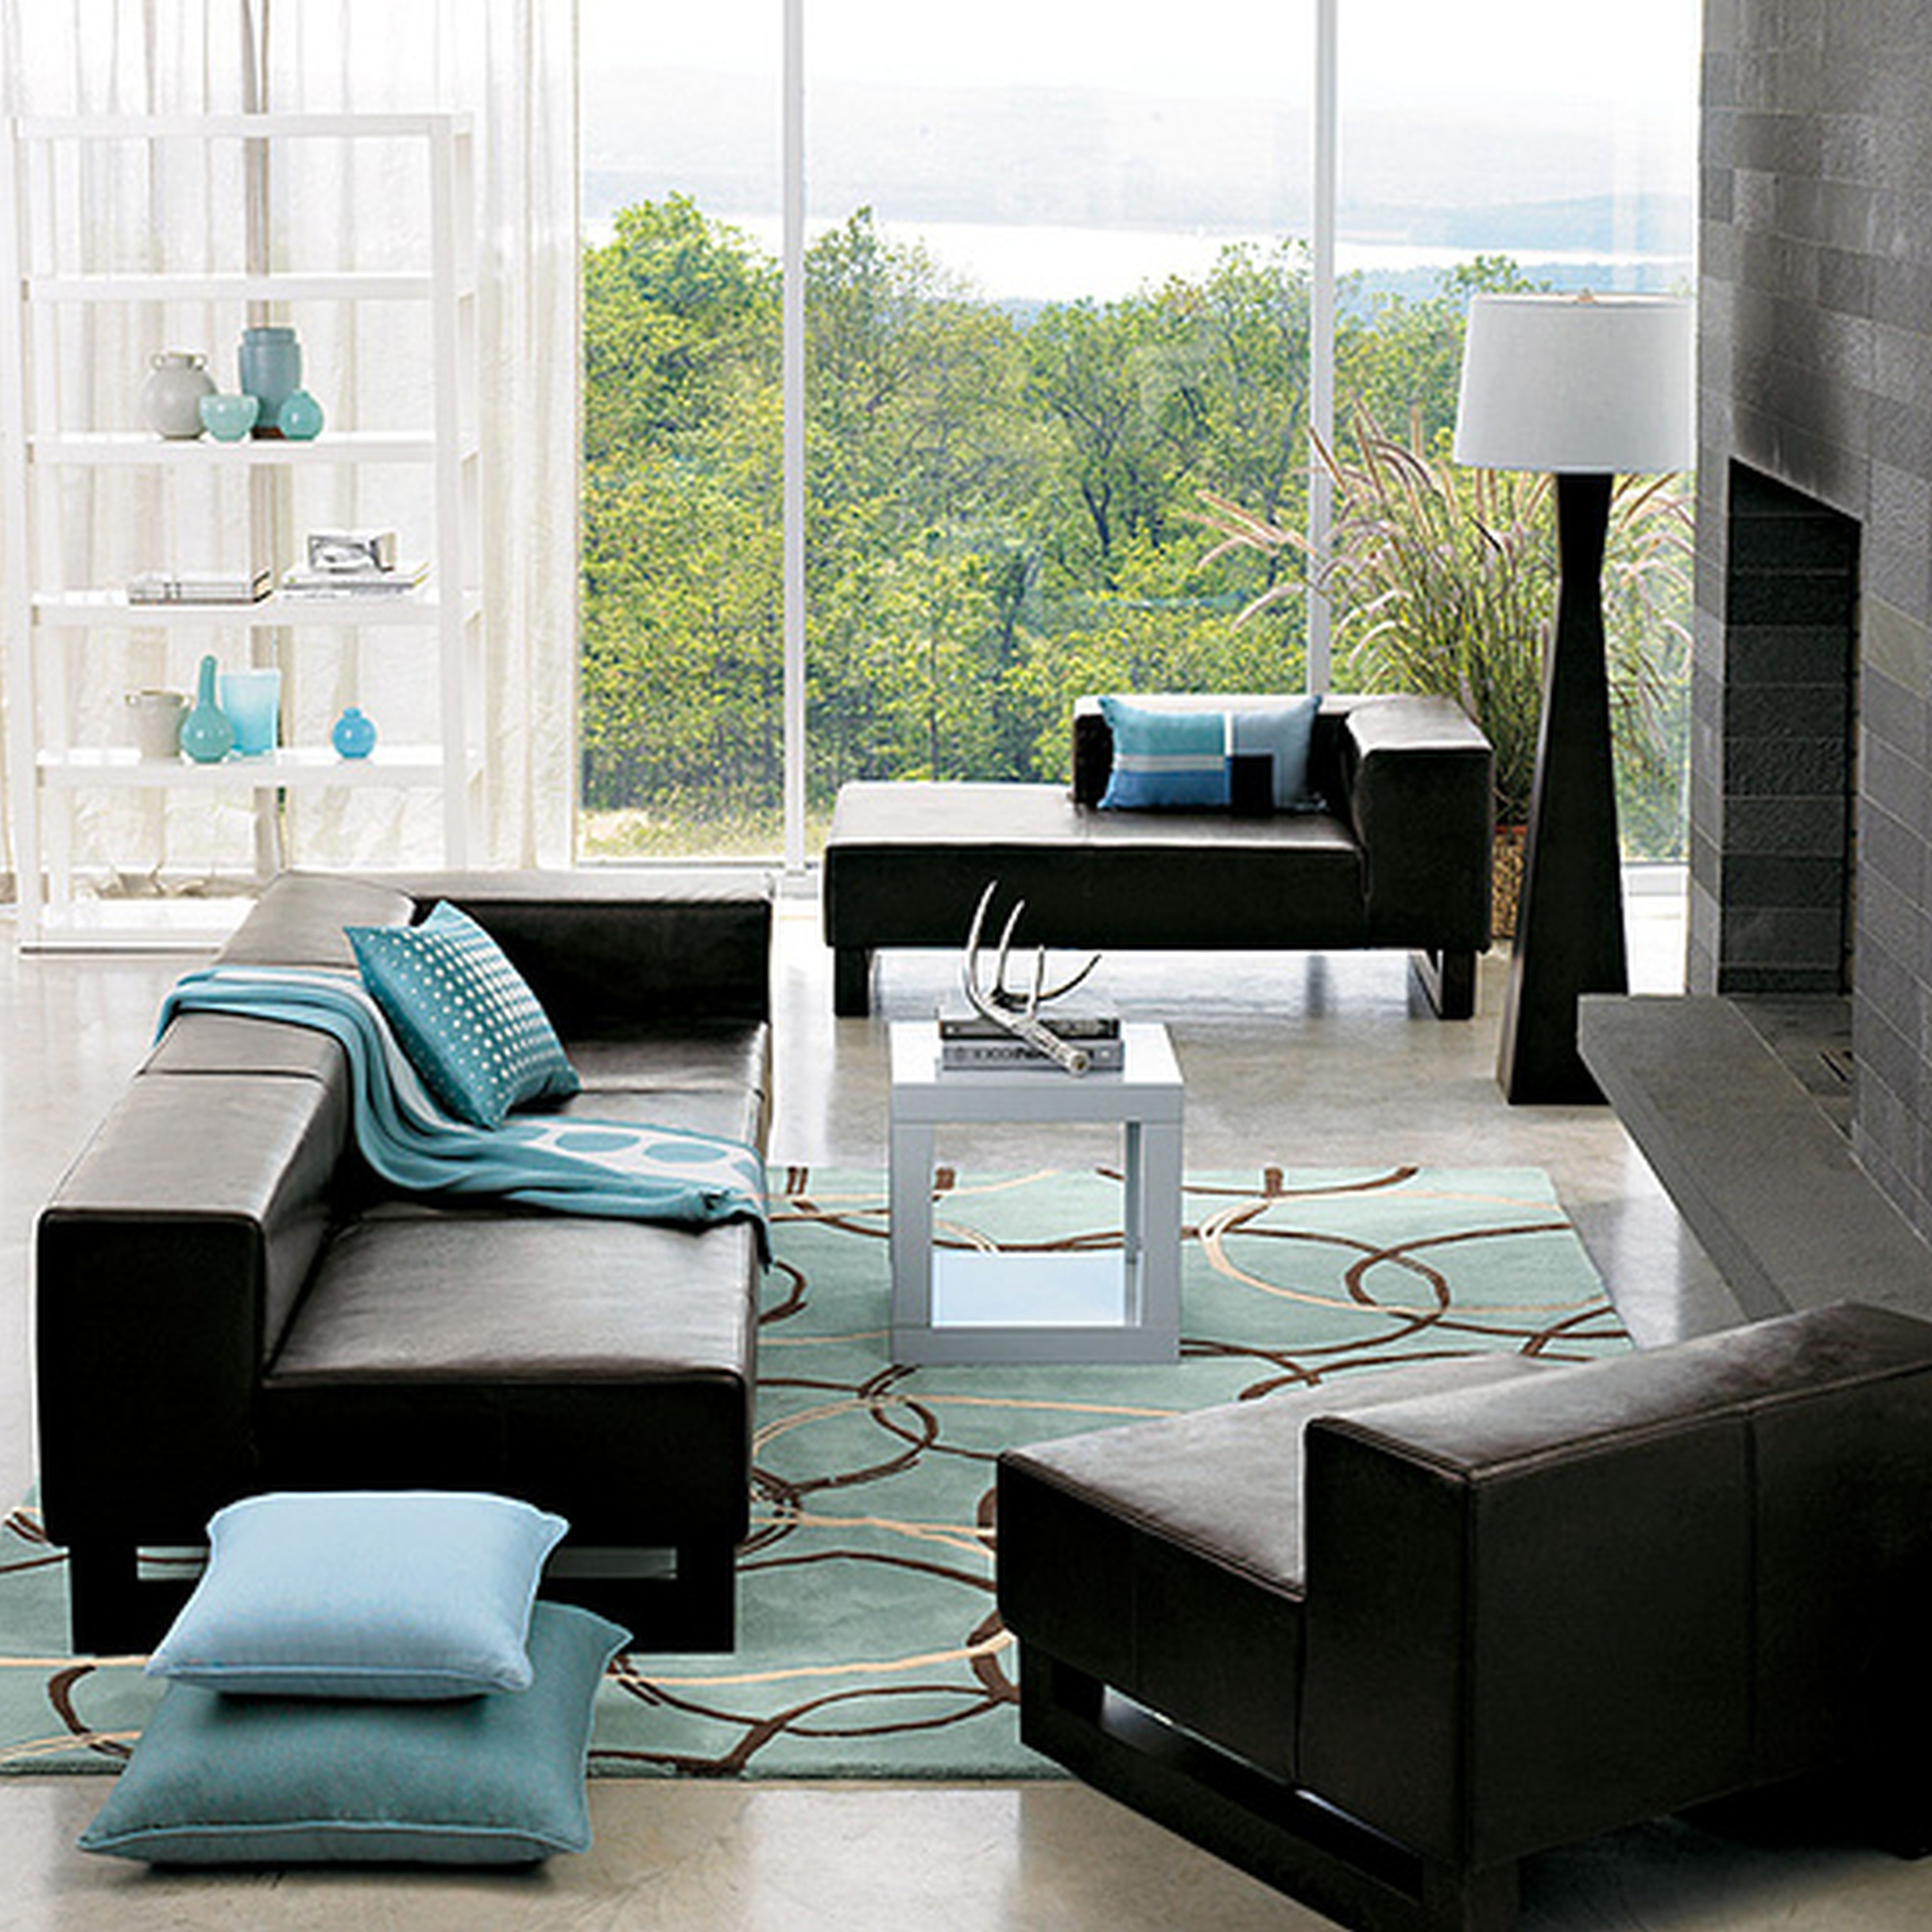 Affordable home design ideas